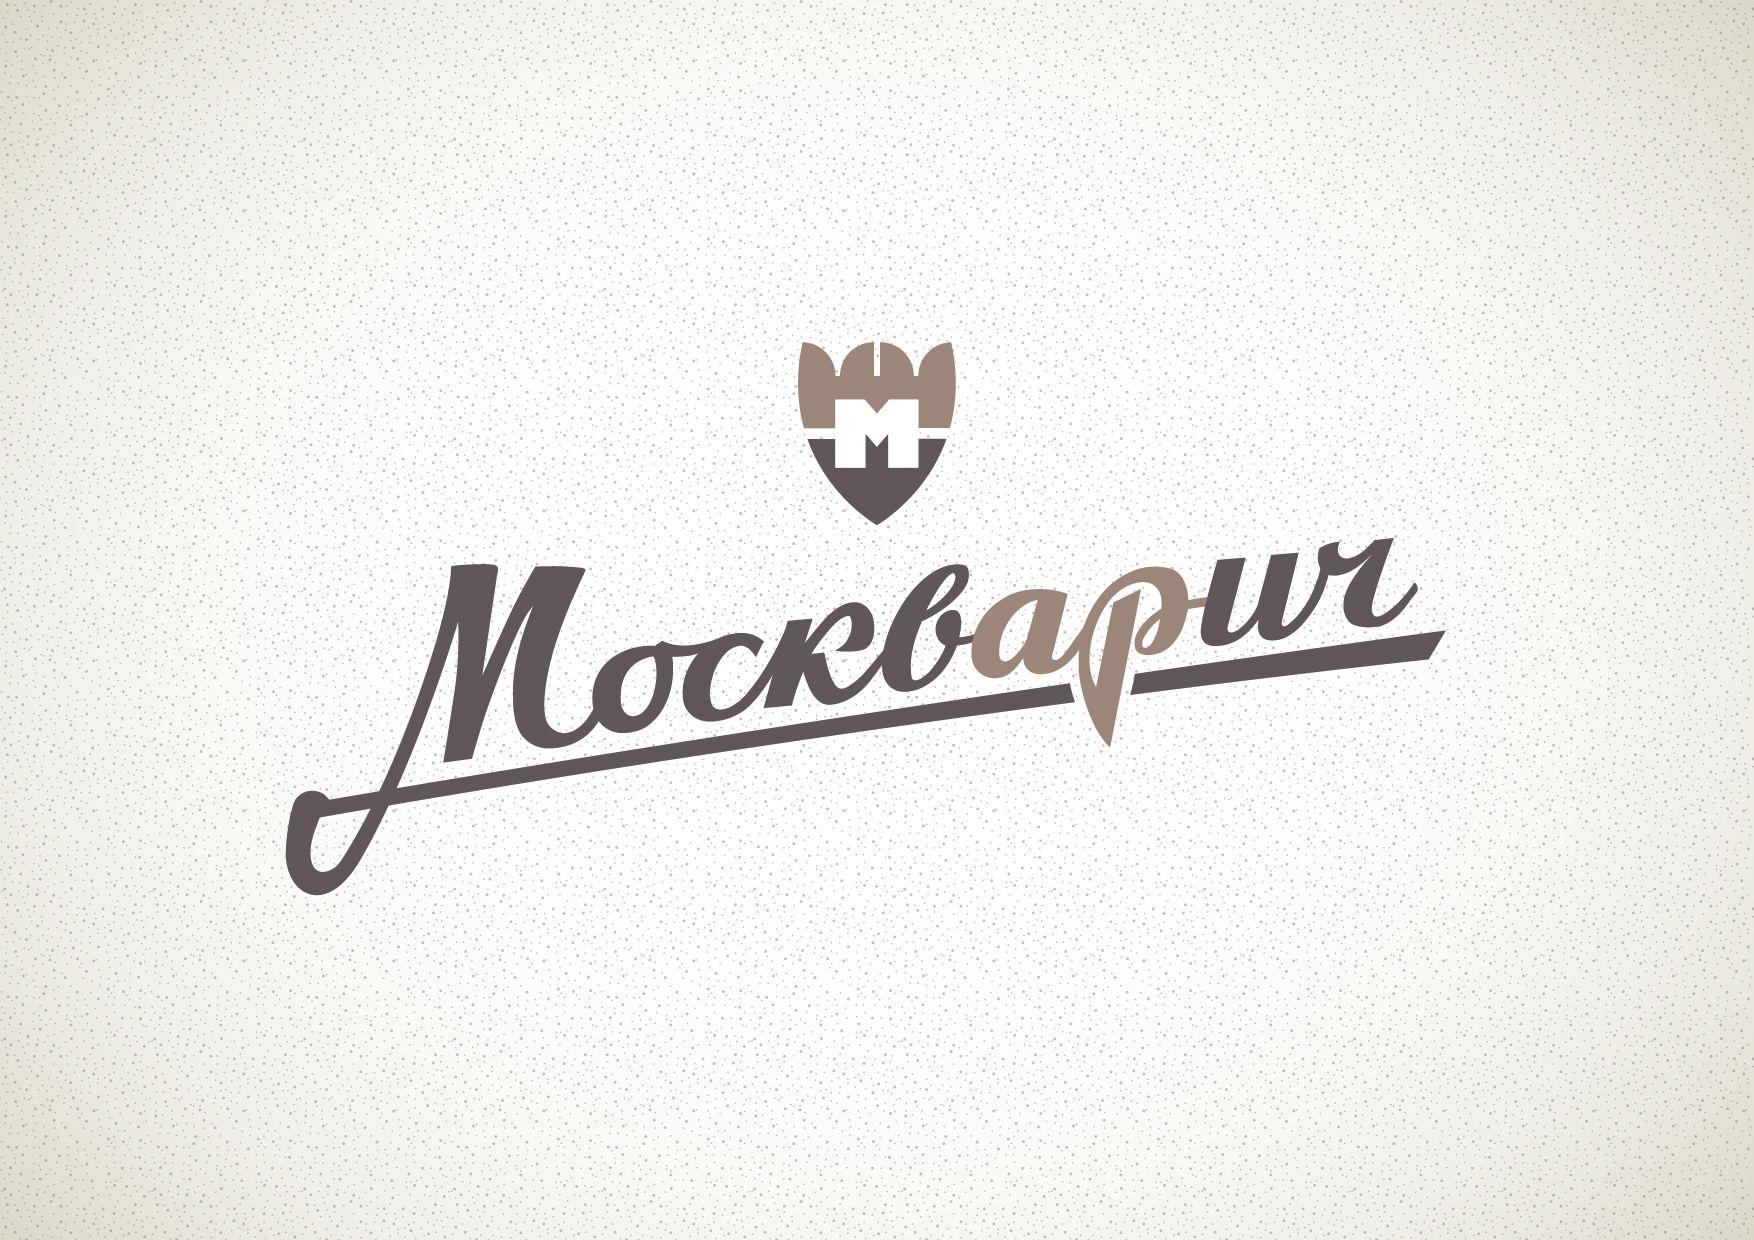 Логотип для бренда одежды (без ФС) - дизайнер grrssn